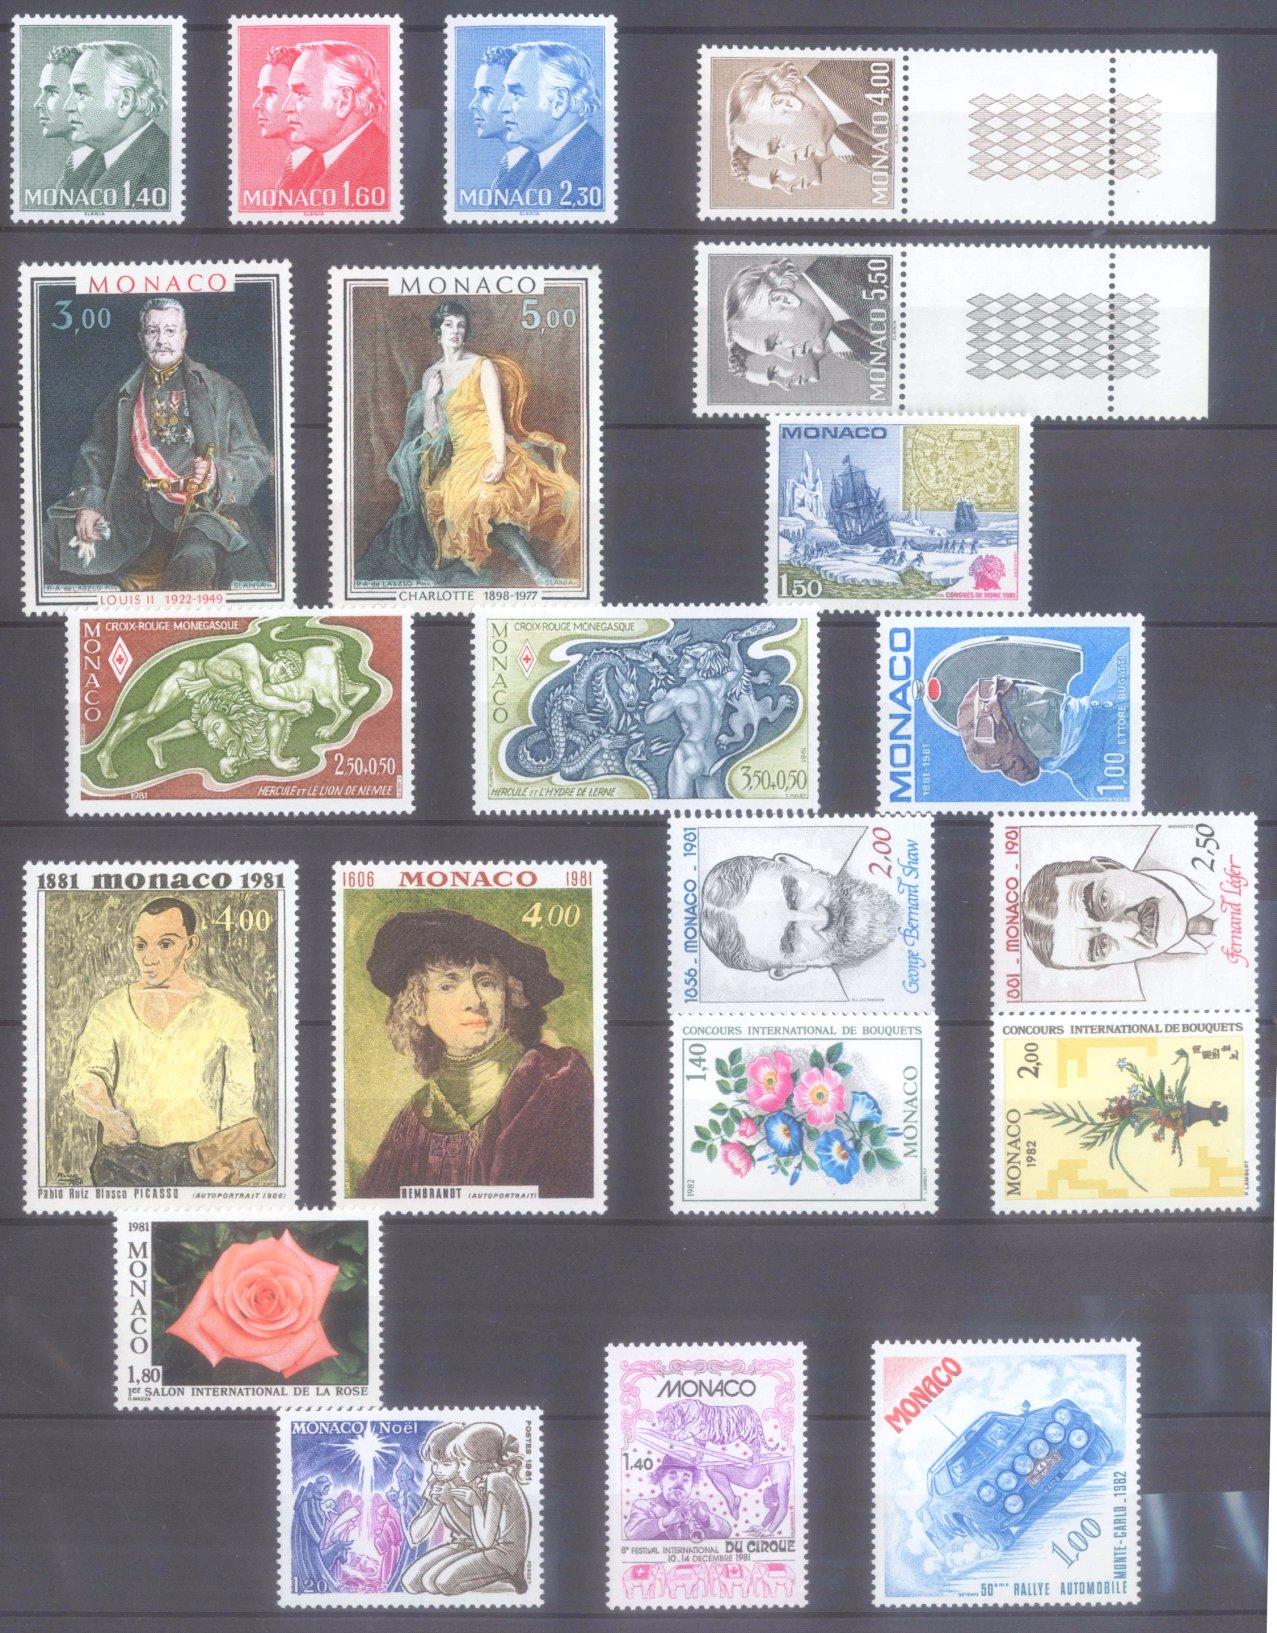 MONACO 1953-1989, Katalogwert 970,- Euro-11